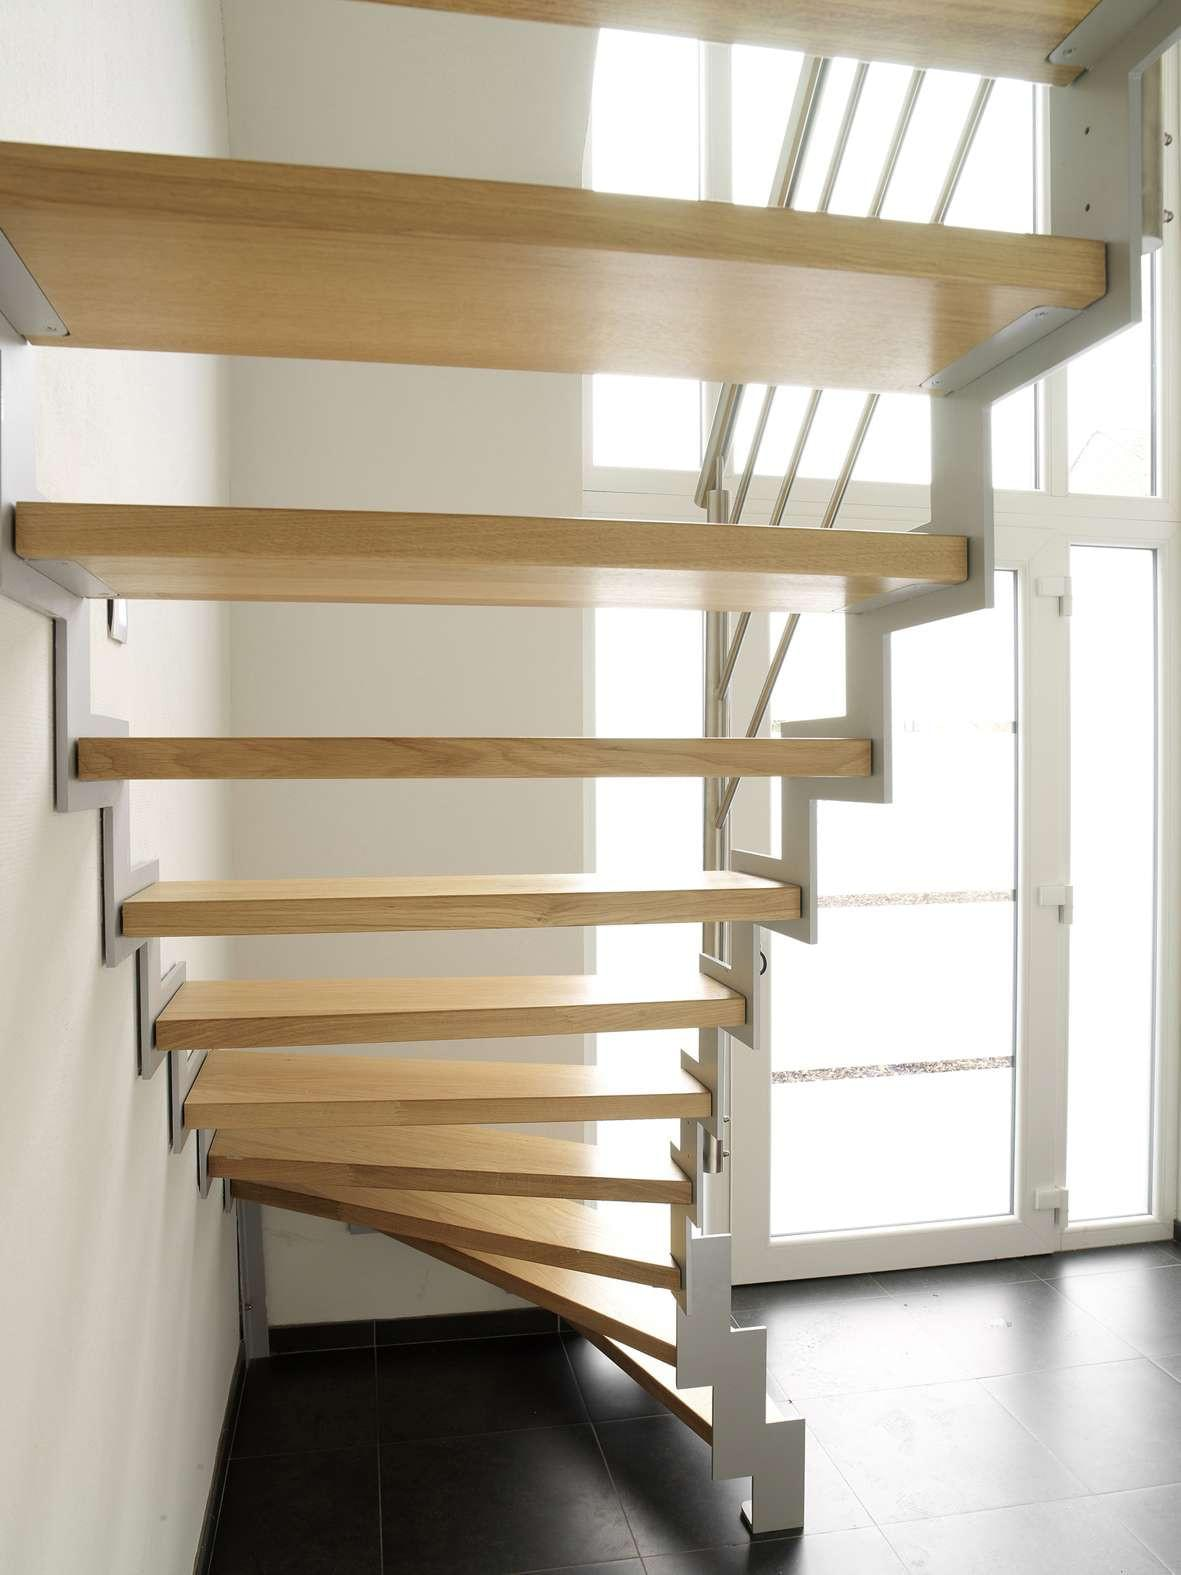 trap-hedendaags-interieur-metaal-hout